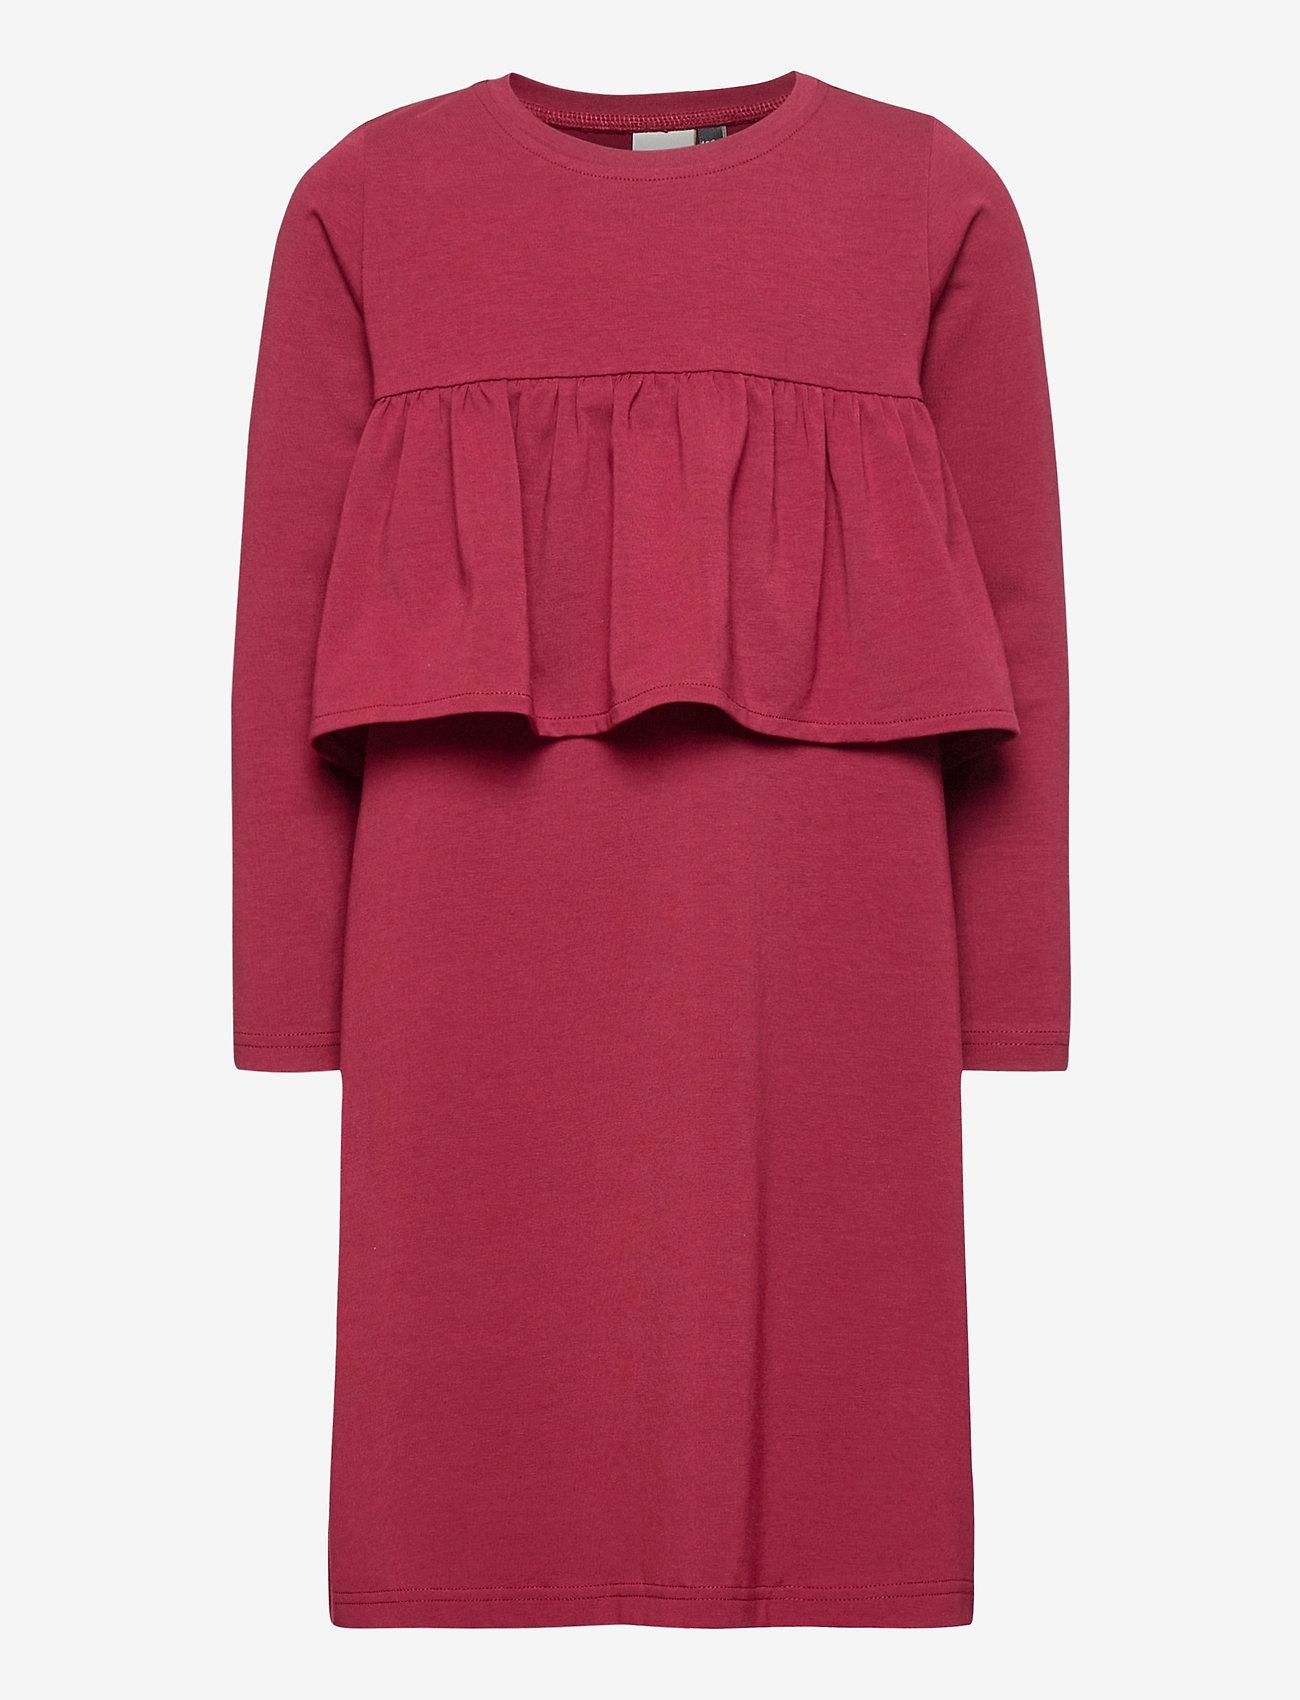 Papu - WAVE DRESS - kleider - deep red - 0